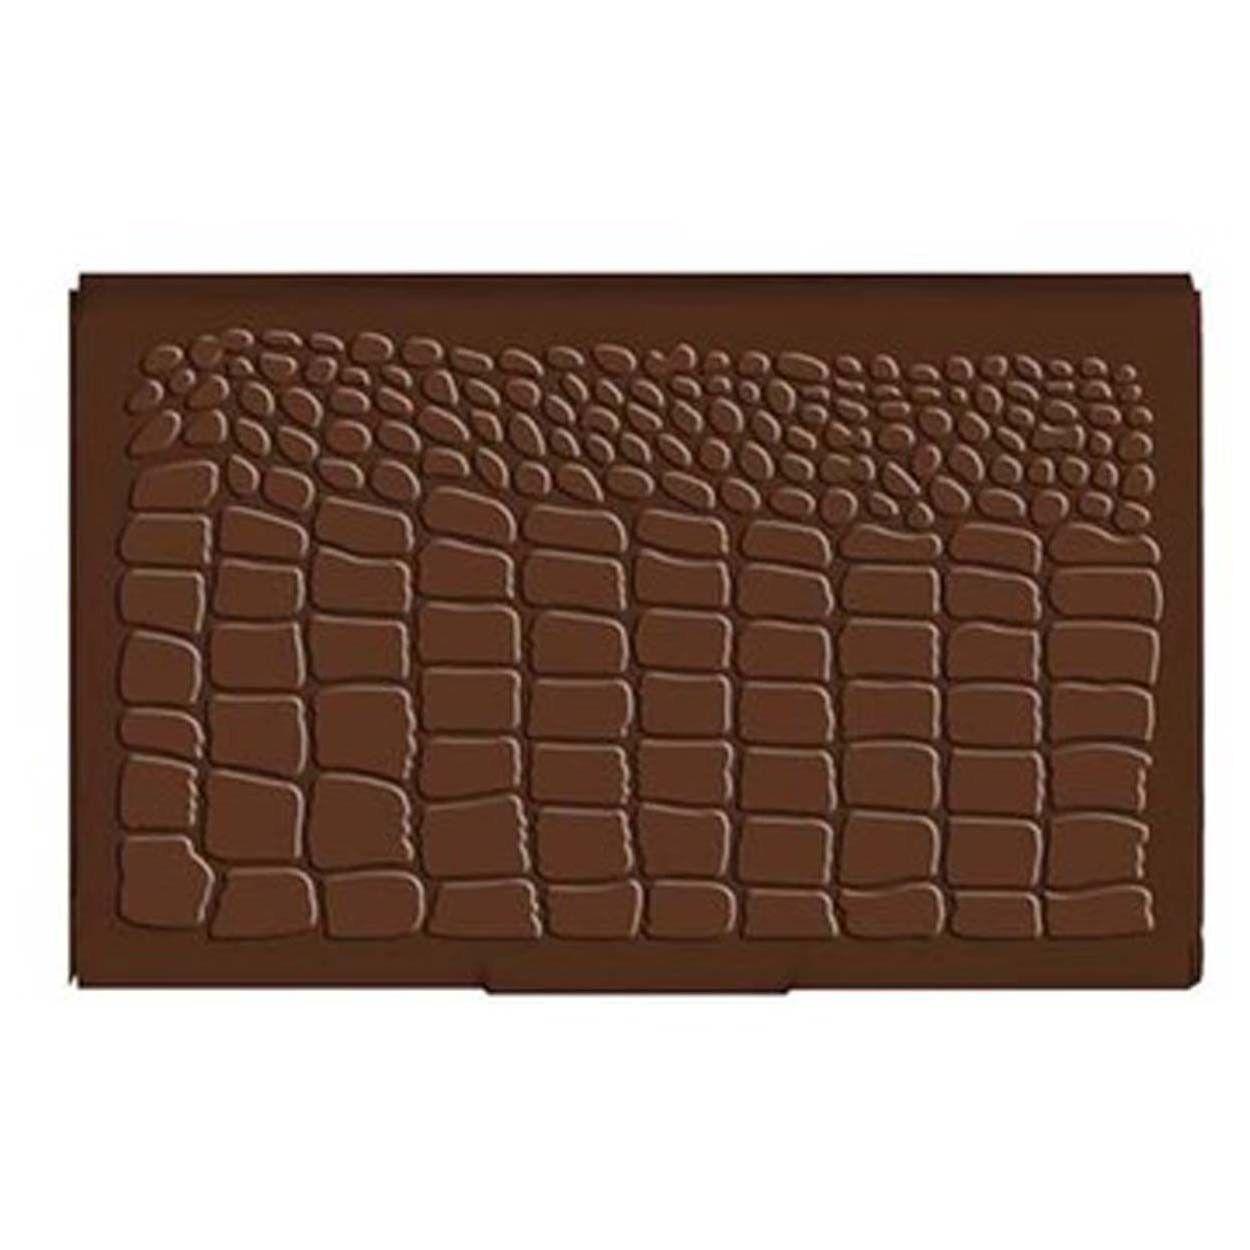 #2441 Business-Gift-Credit Card-Money Aluminum Case Brown Croc Crocodile